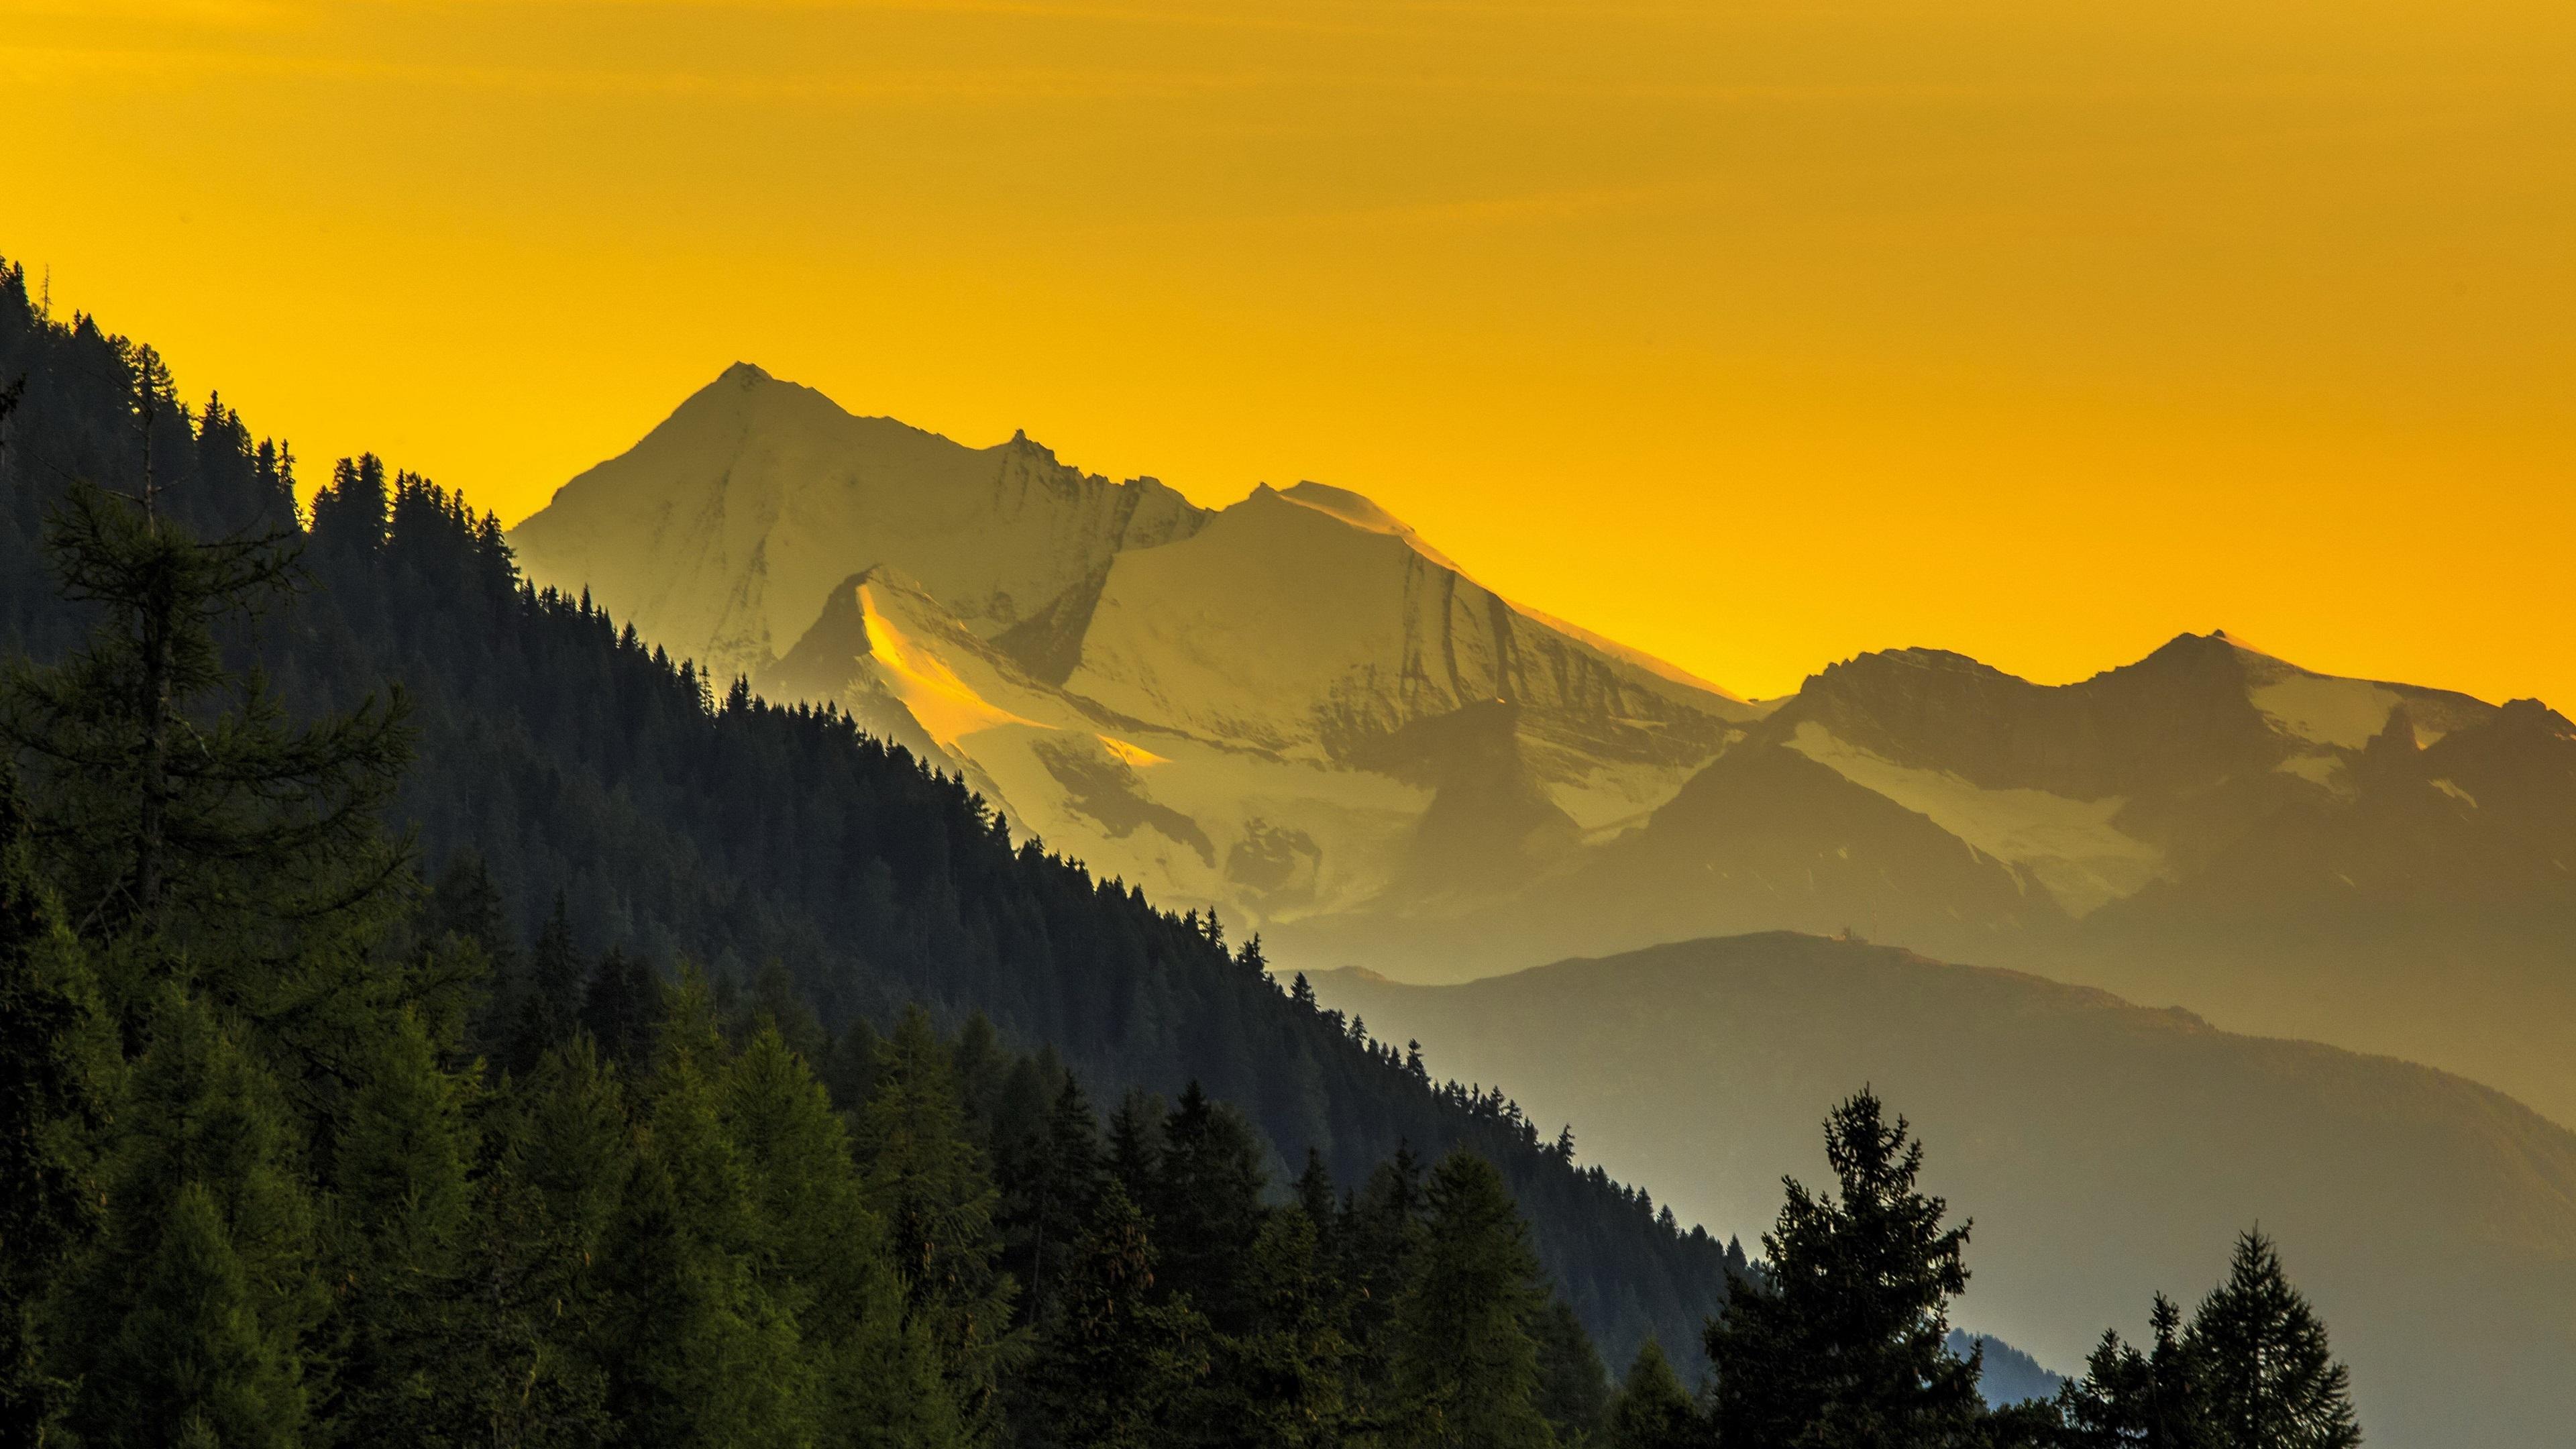 hills yellow landscape 1574937764 - Hills Yellow Landscape -